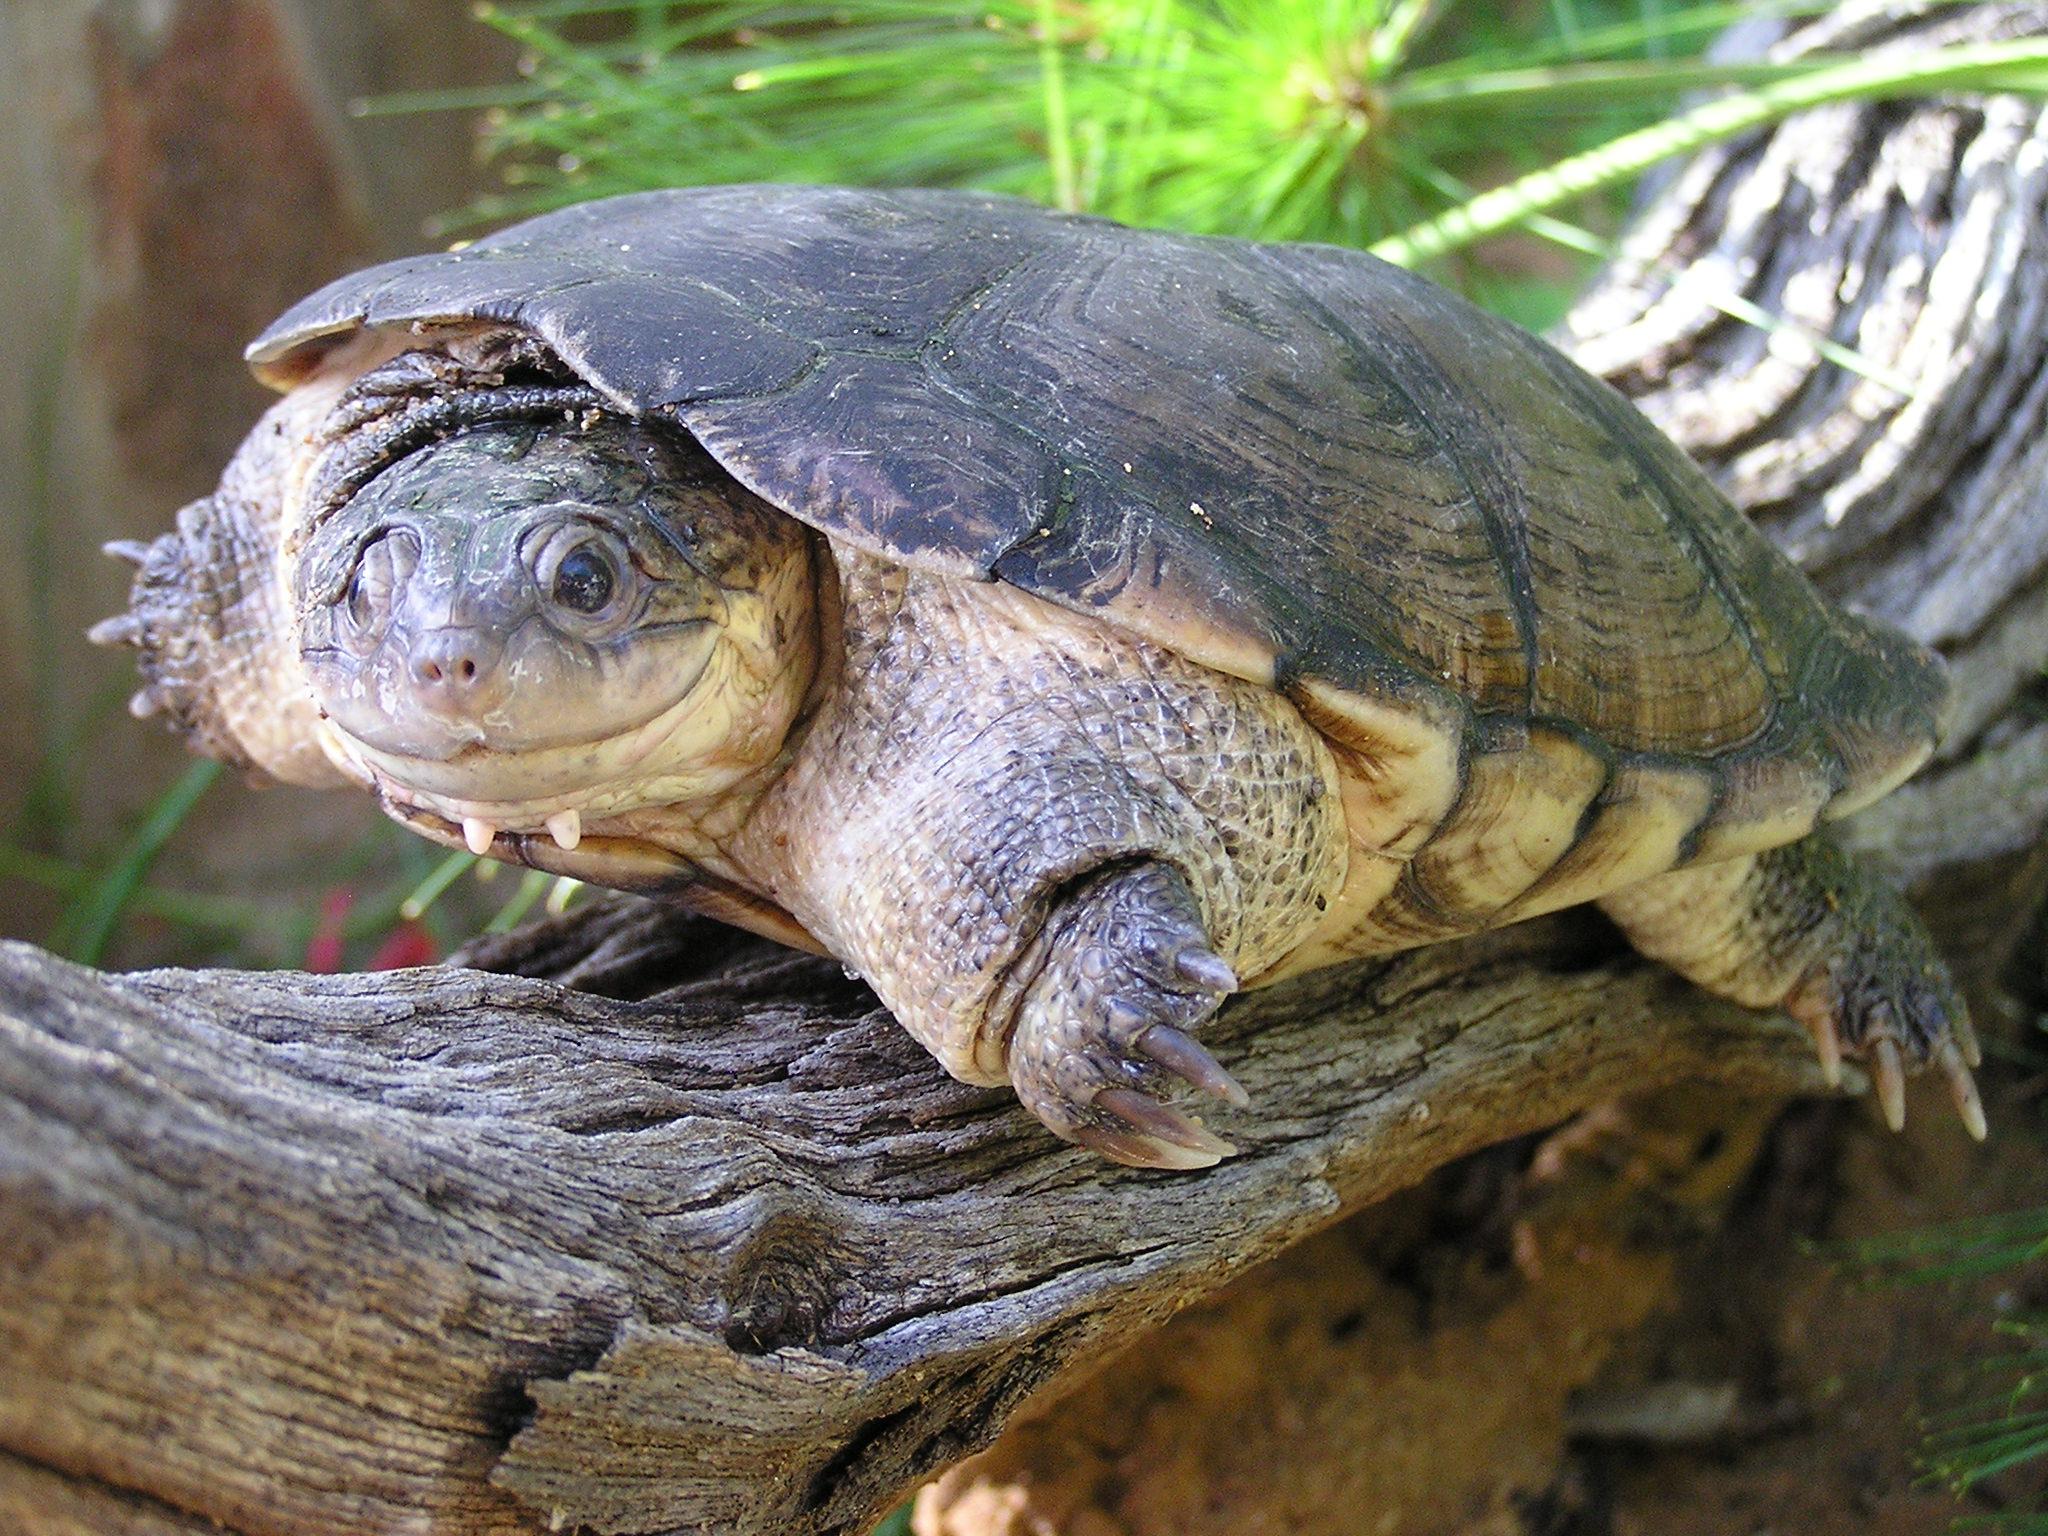 Afrikanische Schildkröte: Bedrohter, als gedacht